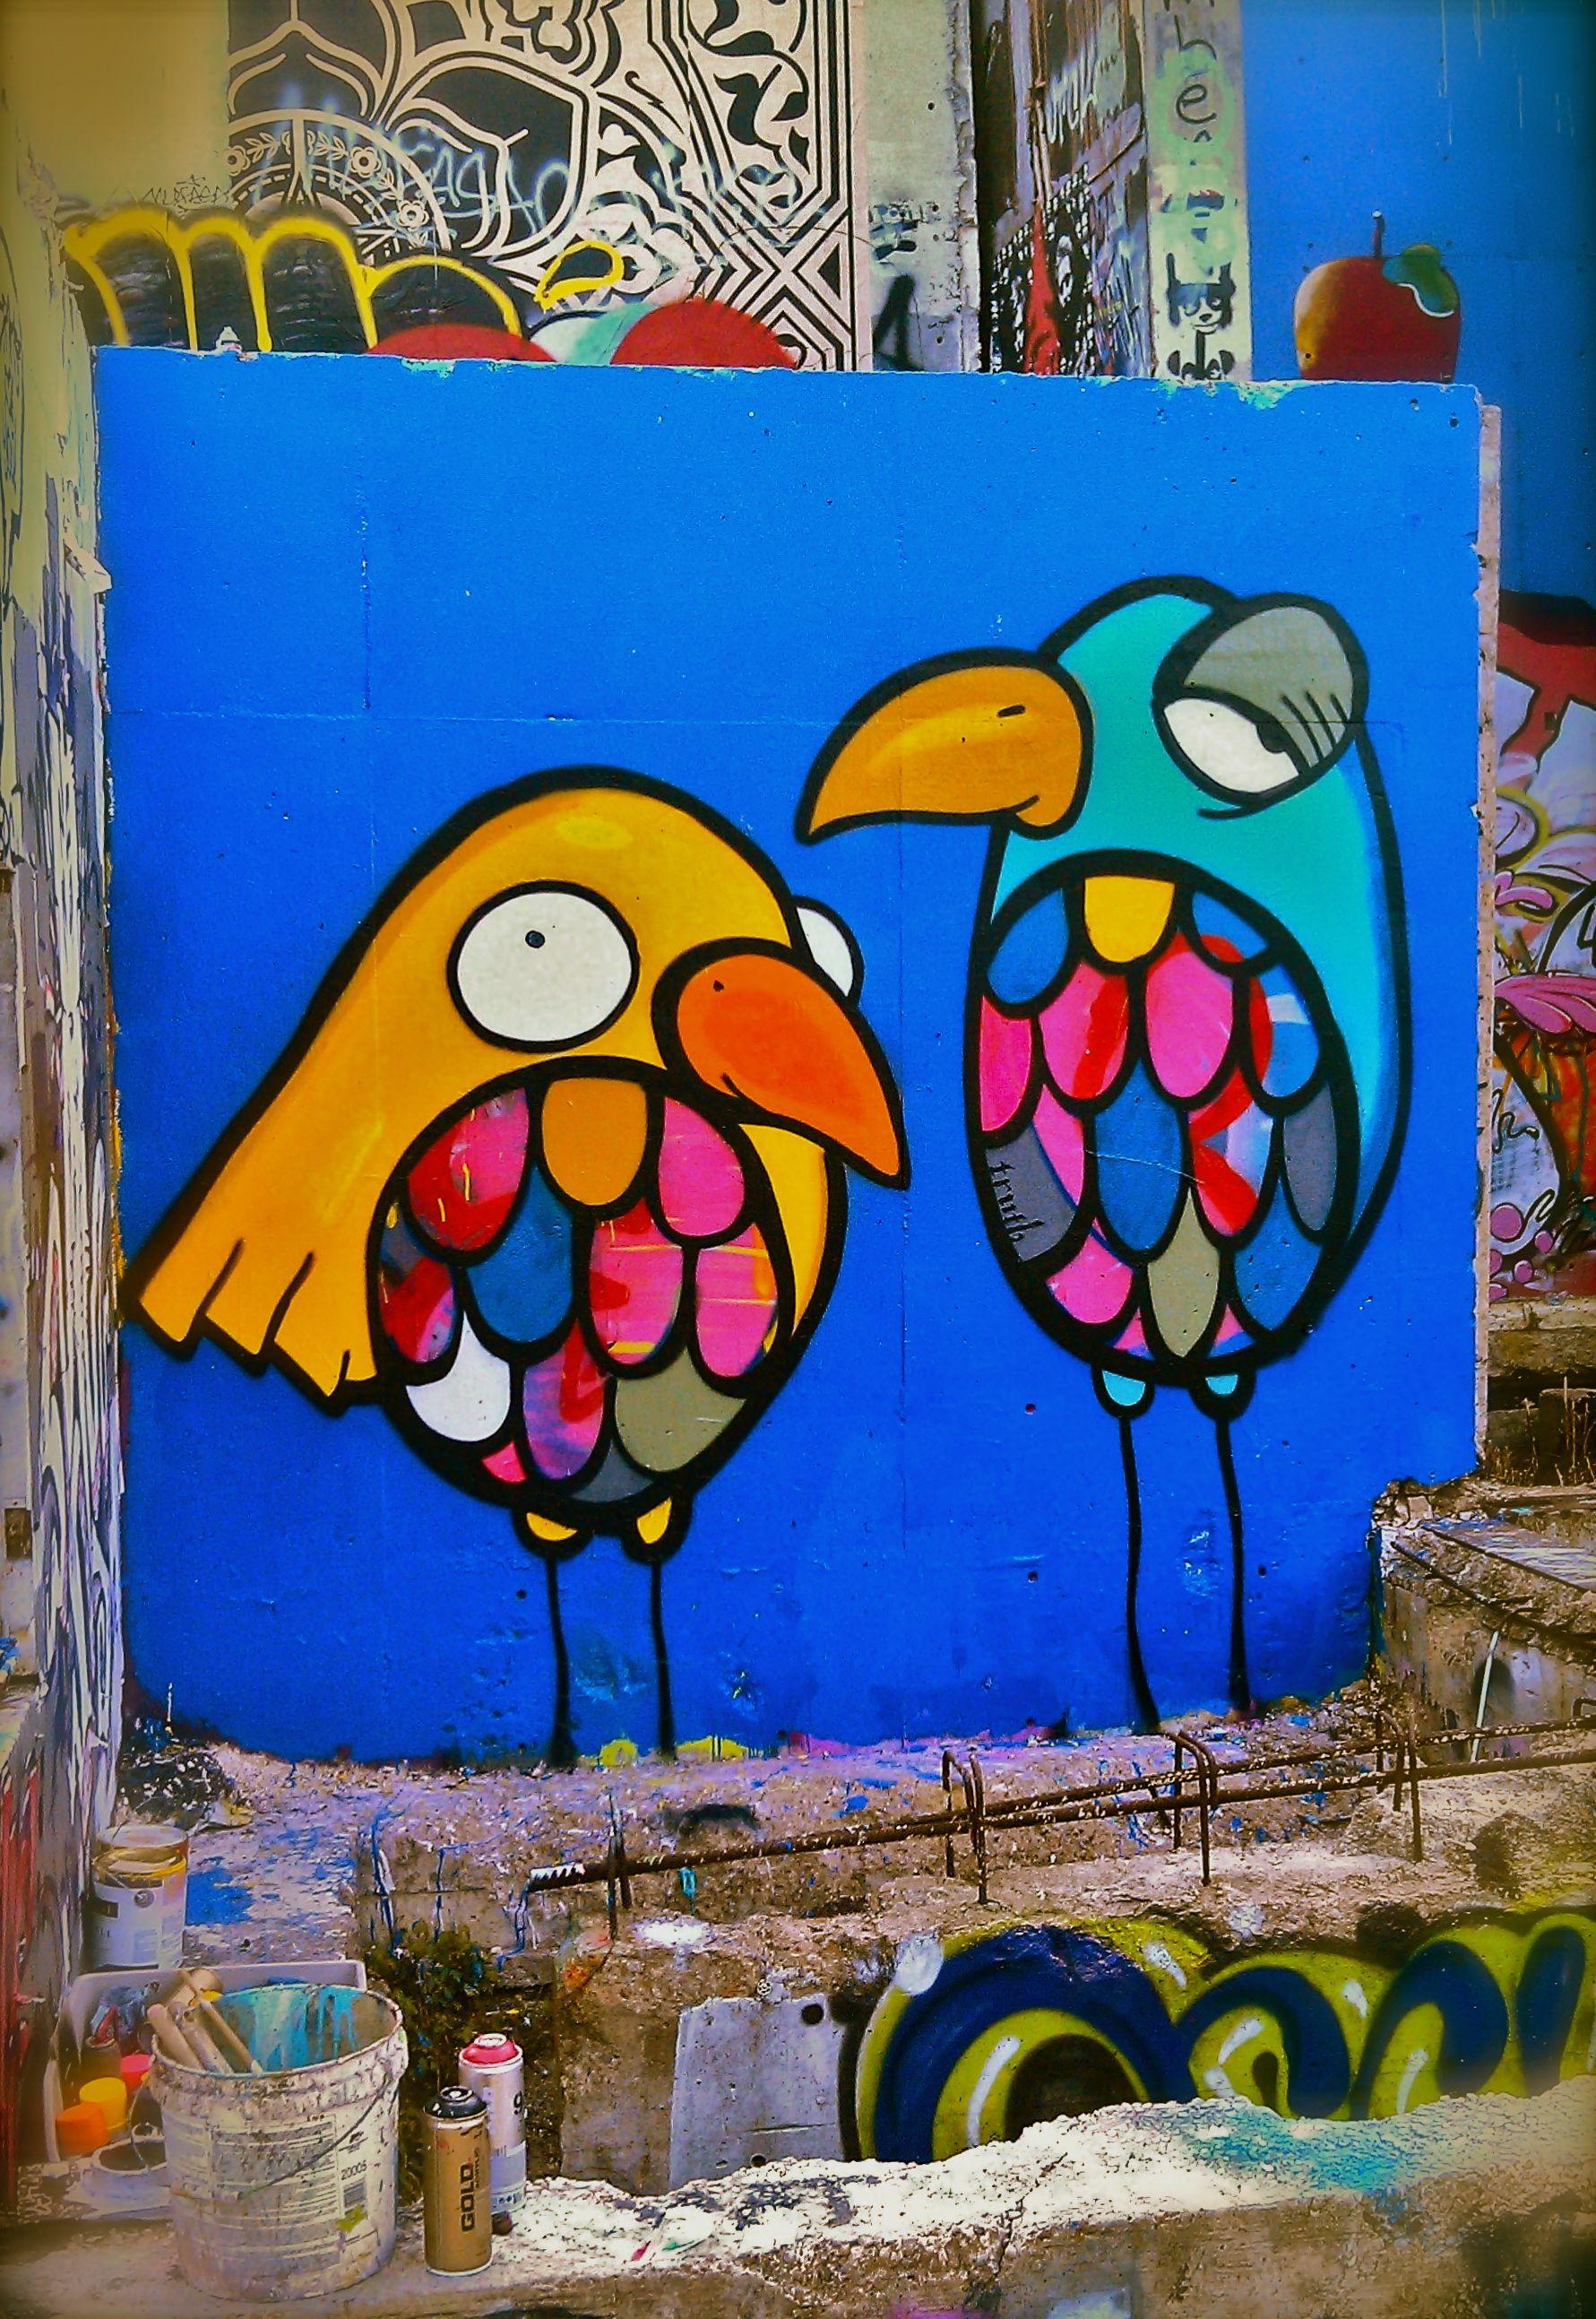 Street Art Truth Hope Outdoor Gallery Mural Wall Art Mural Painting Mural